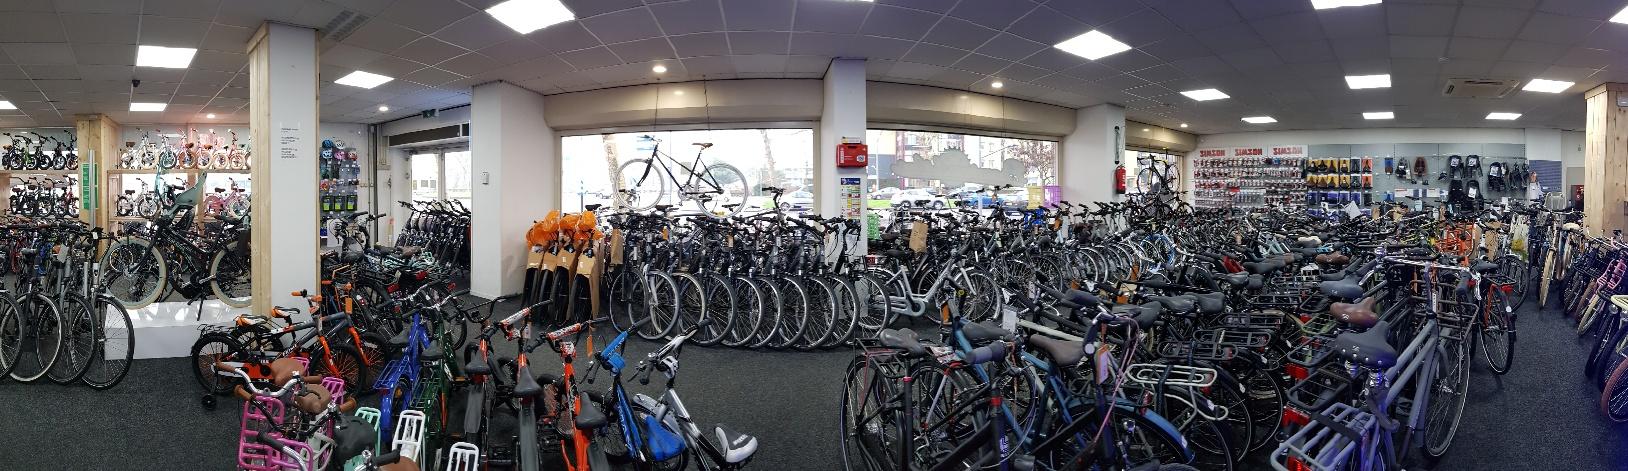 Fietsenwinkel Rotterdam Showroom